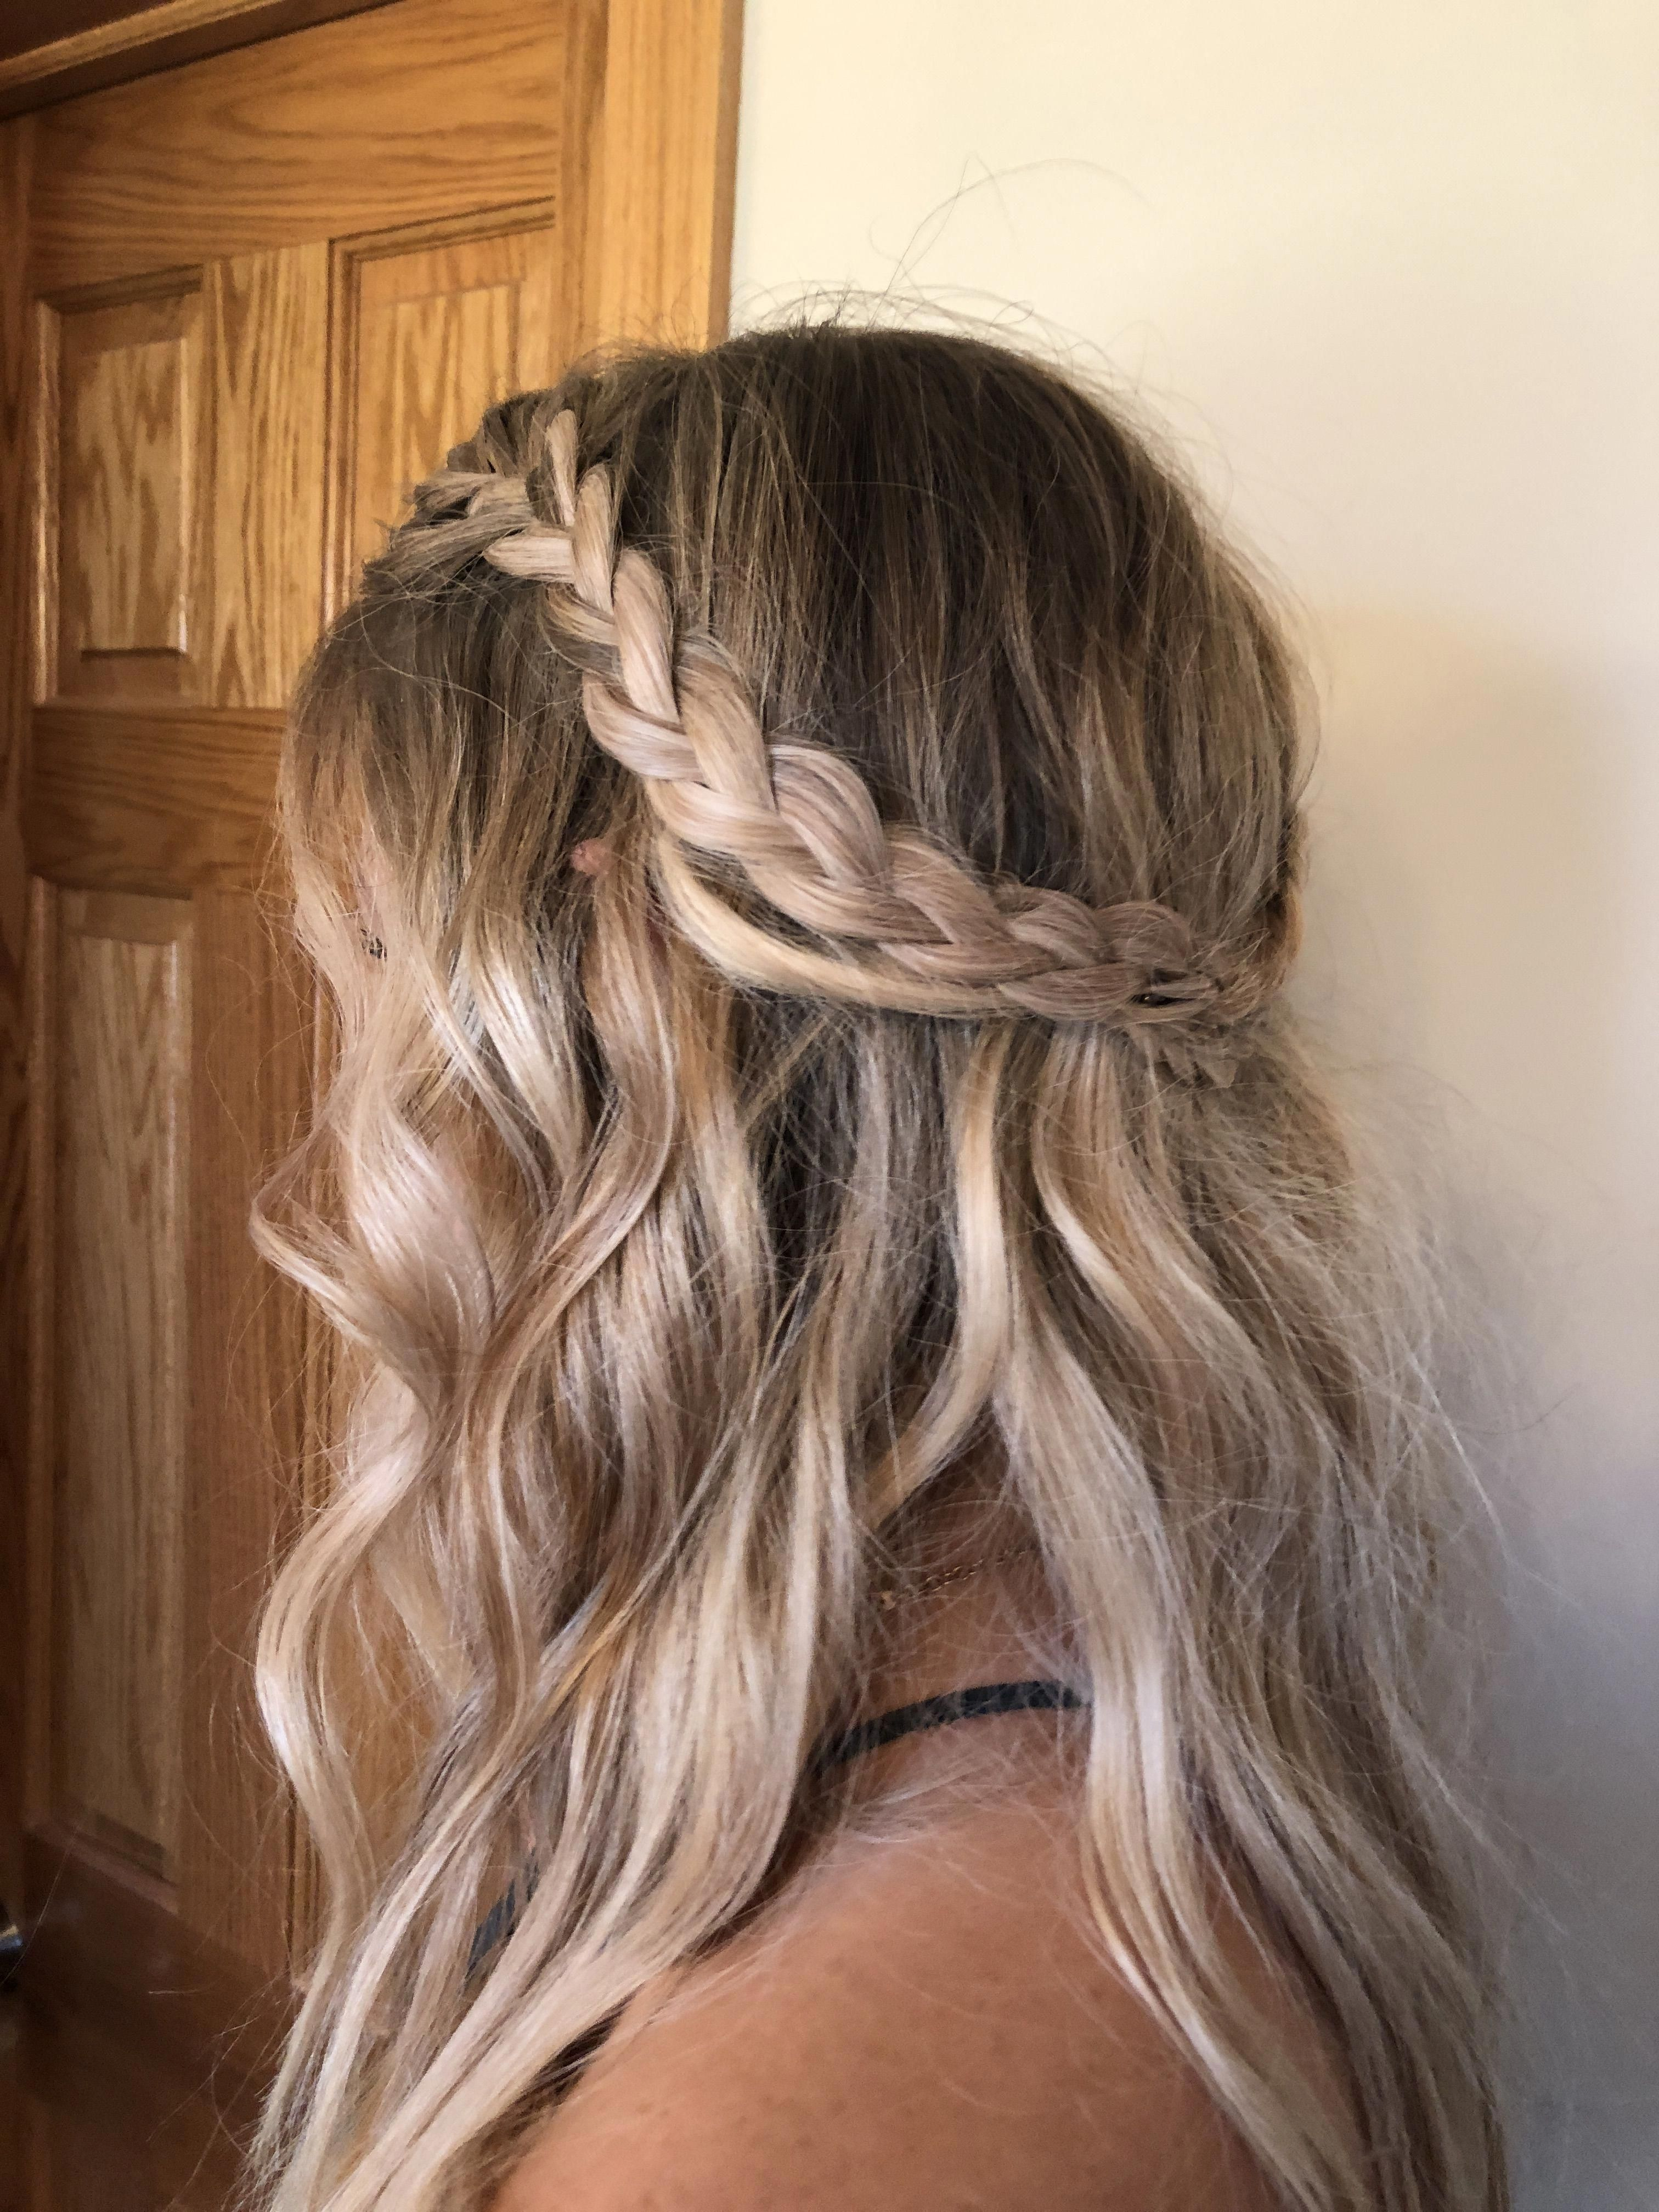 Braided Half Up Half Down Hairstyle Promhairstyleshalfuphalfdown Prom Hair Down Wedding Hair Down Hair Down With Braid